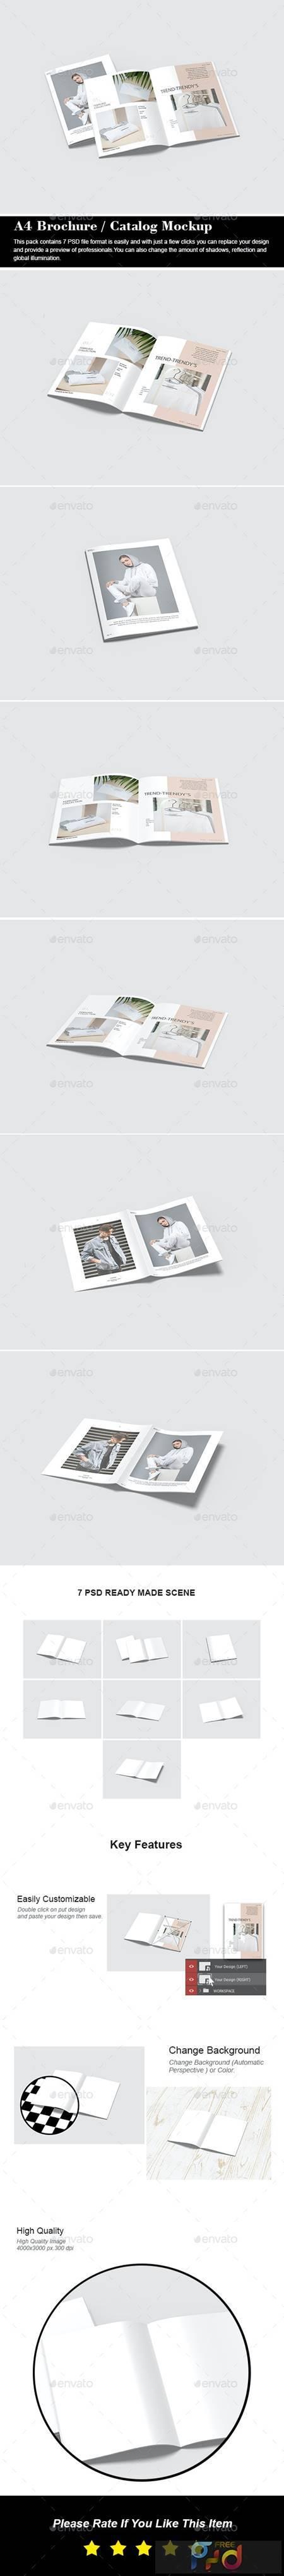 A4 Brochure - Catalog Mockup - 29429258 1